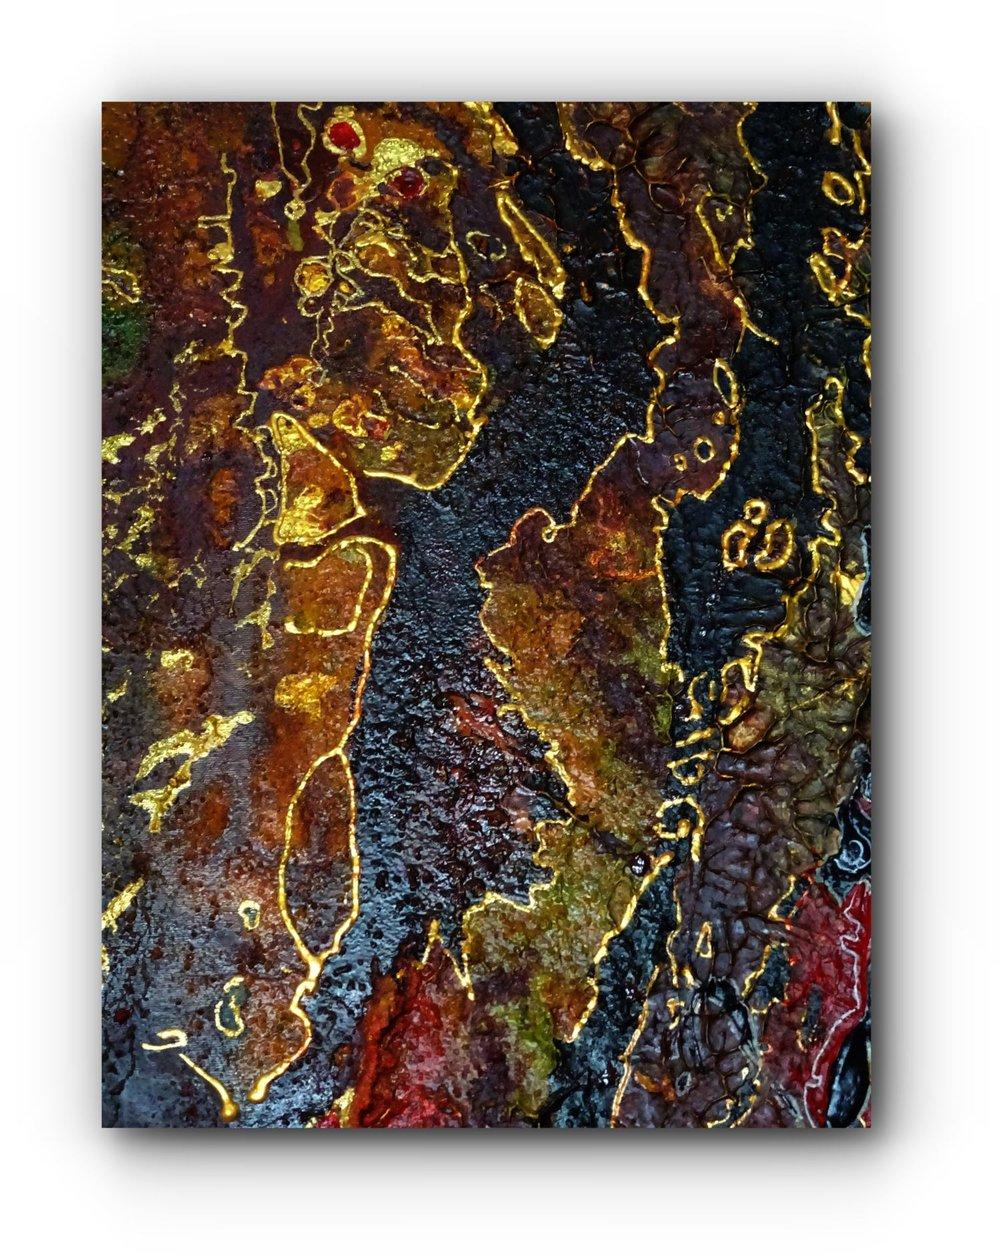 painting-detail-21-golden-sanctuary-artists-ingress-vortices.jpg